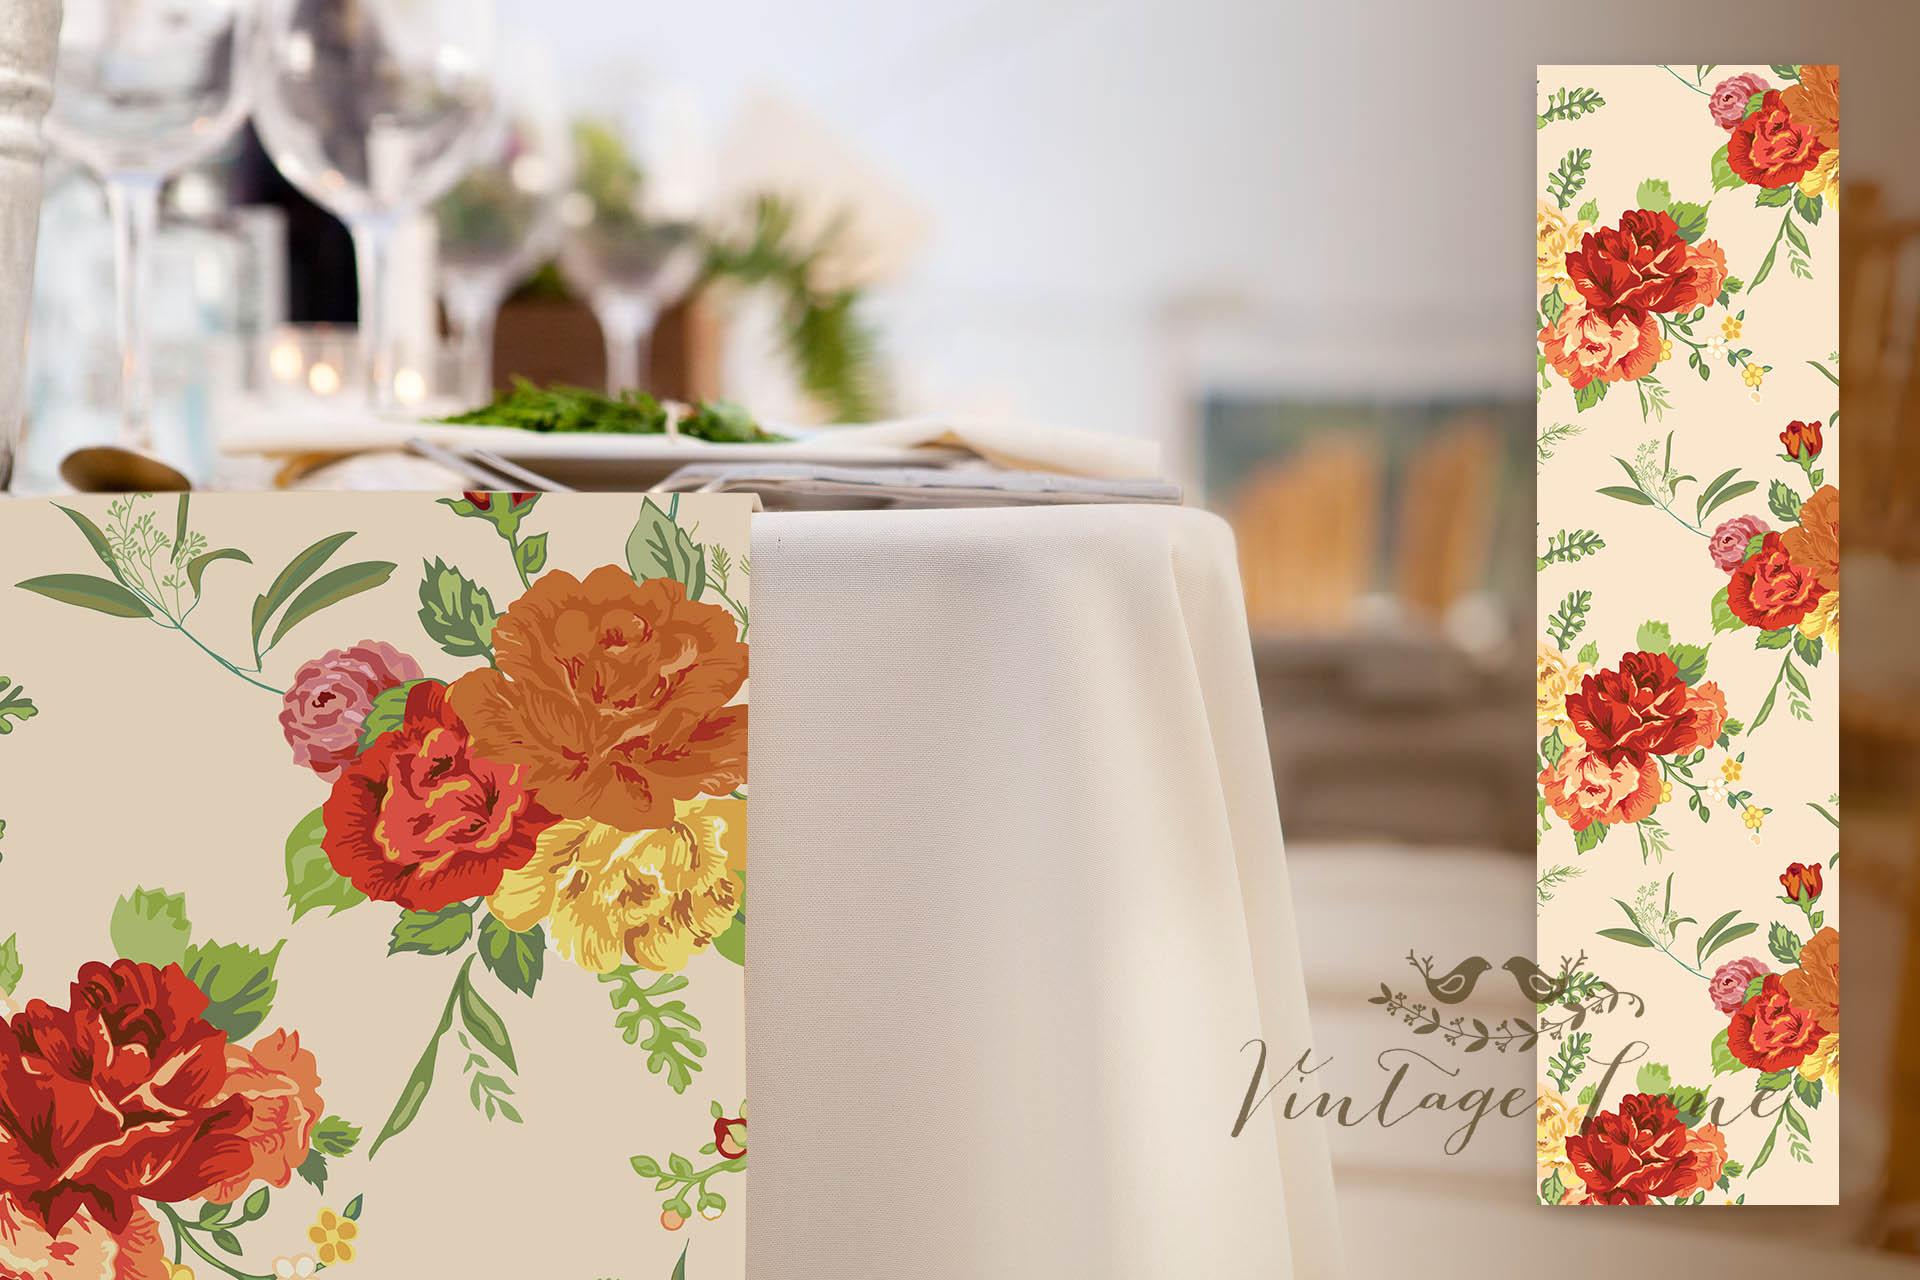 Wedding table runners vintage lane autumn floral wedding table runners personalised wedding table runners cork ireland junglespirit Choice Image